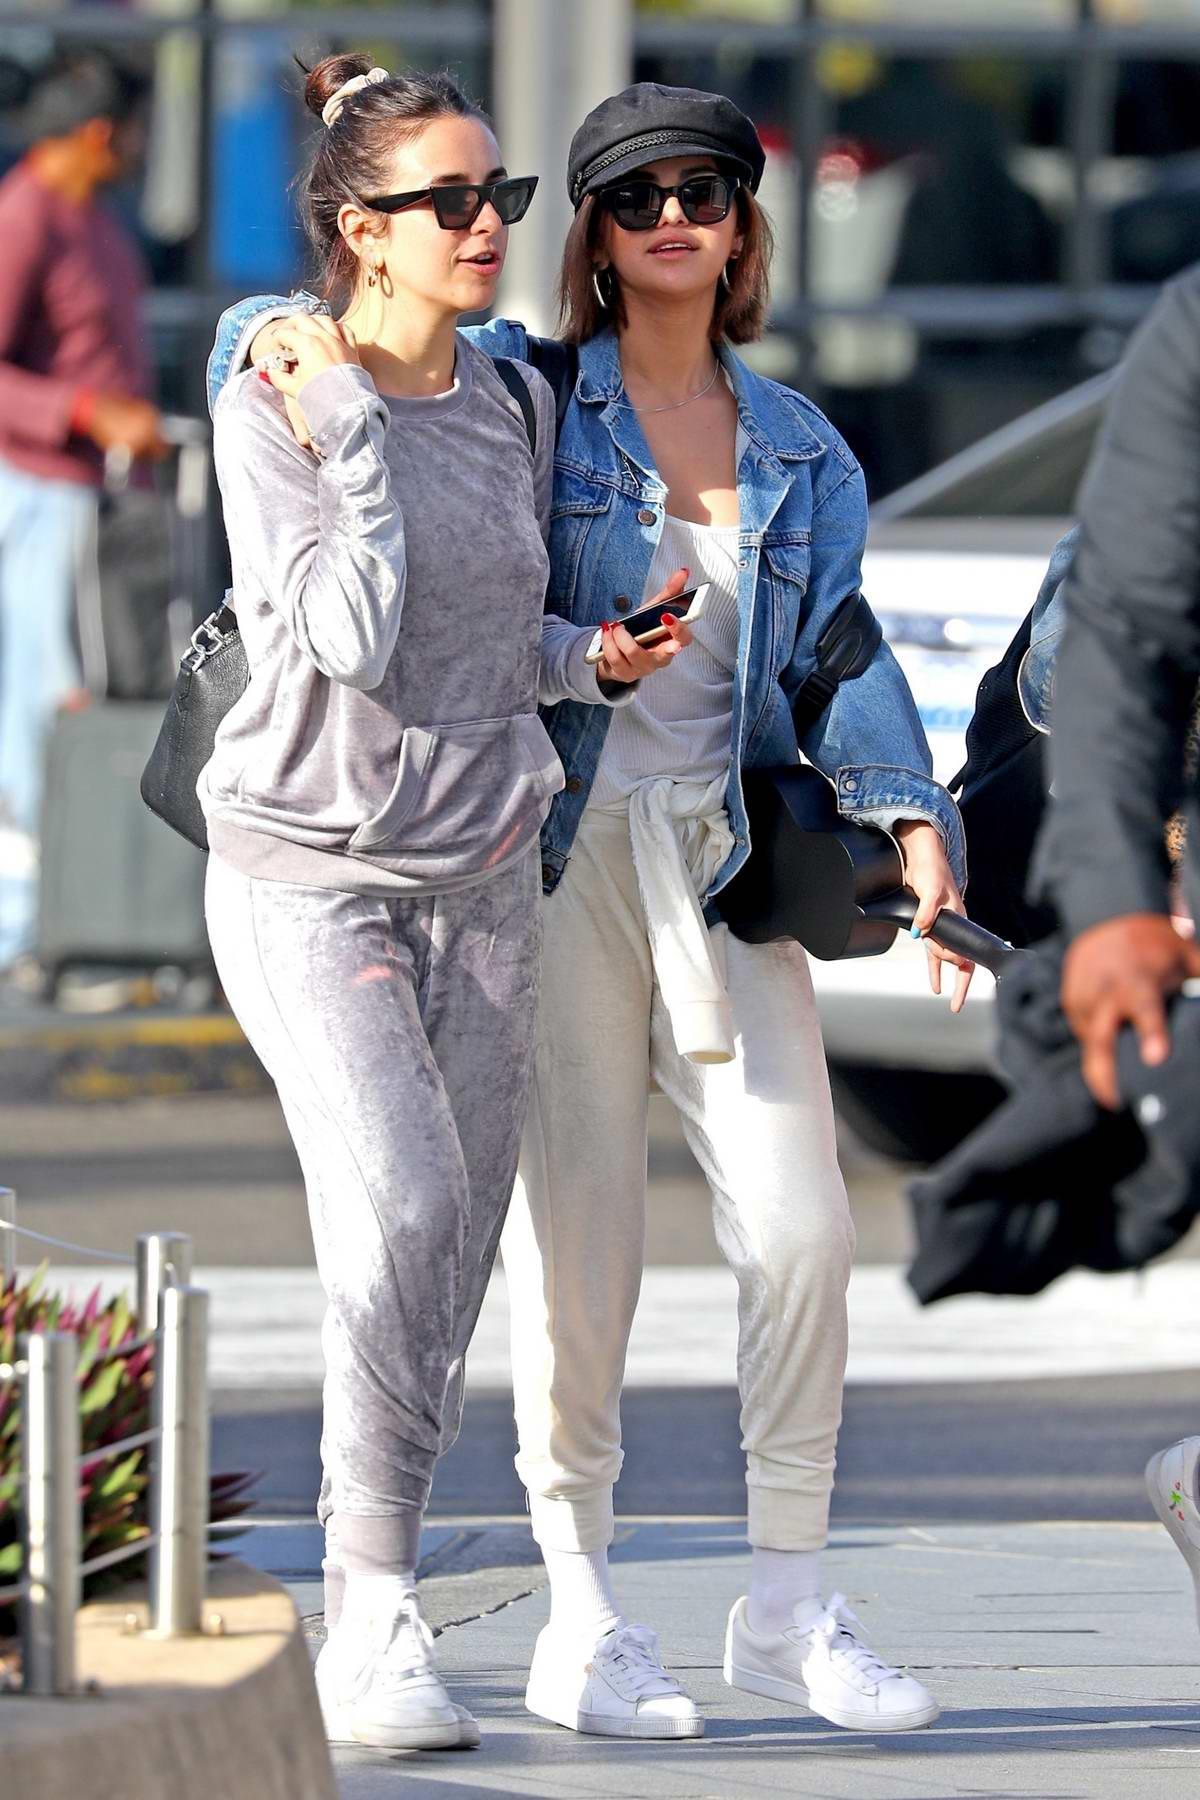 Selena Gomez arrives at Sydney airport carrying her ukulele guitar, Australia